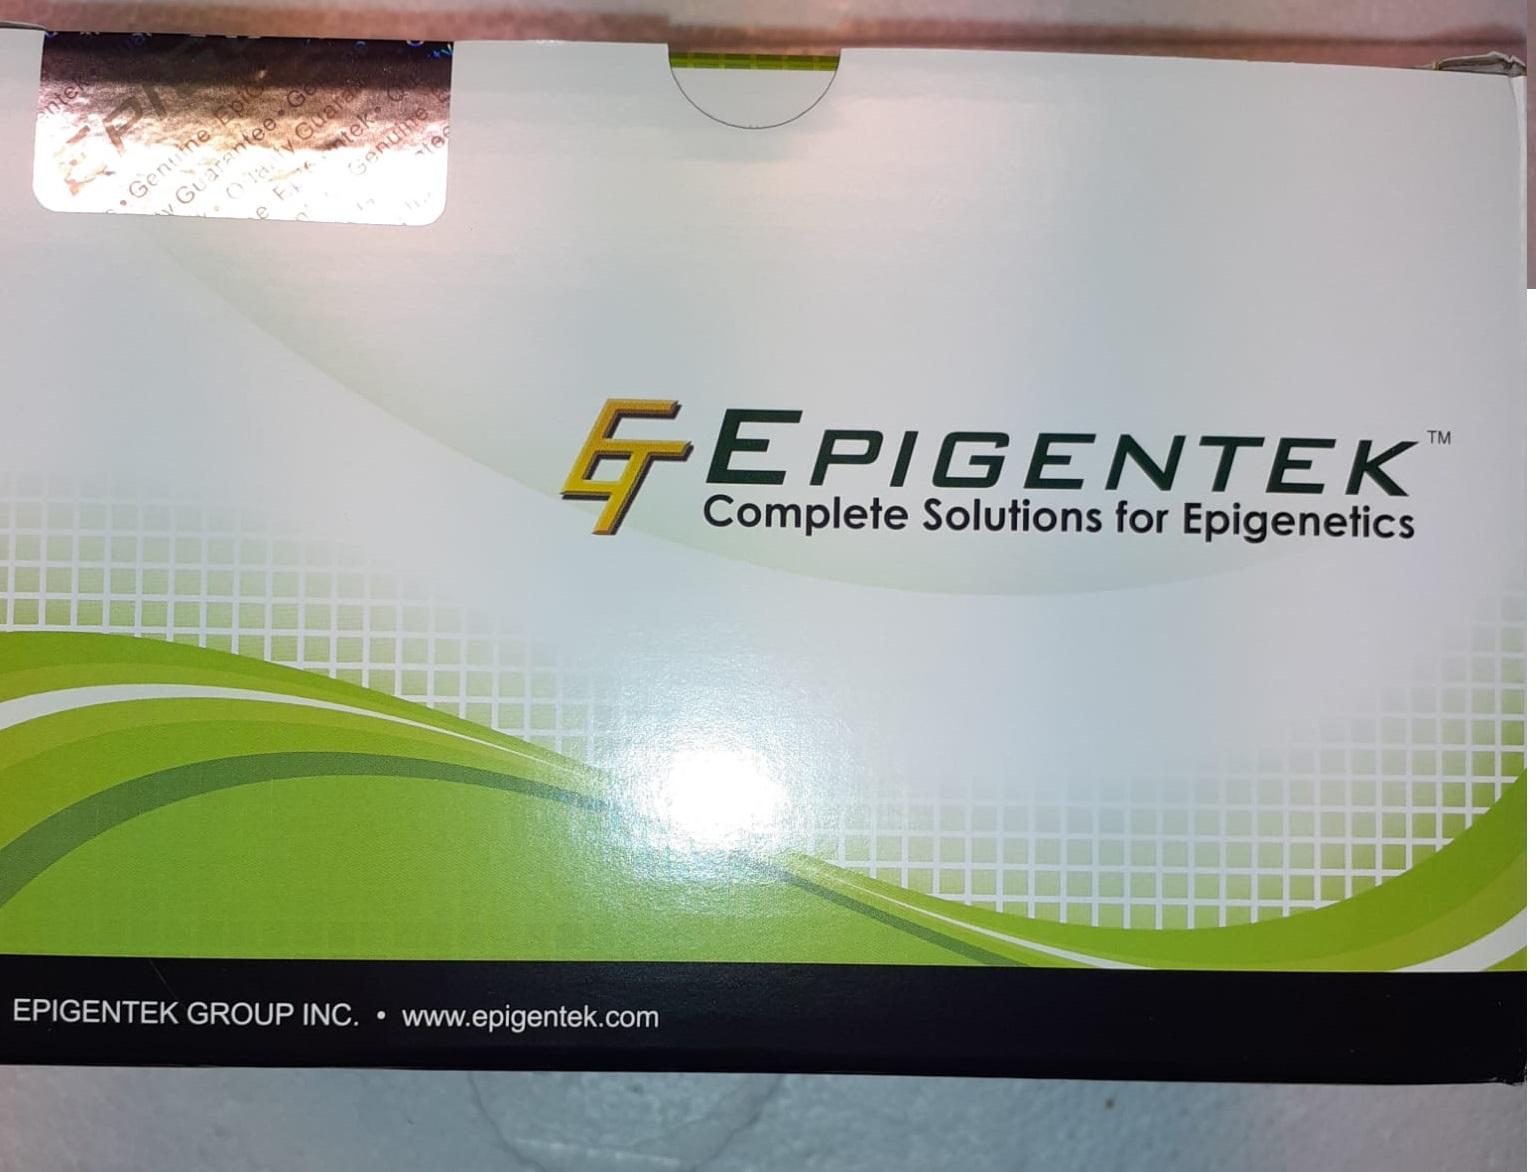 Epigentek Complete Solutions